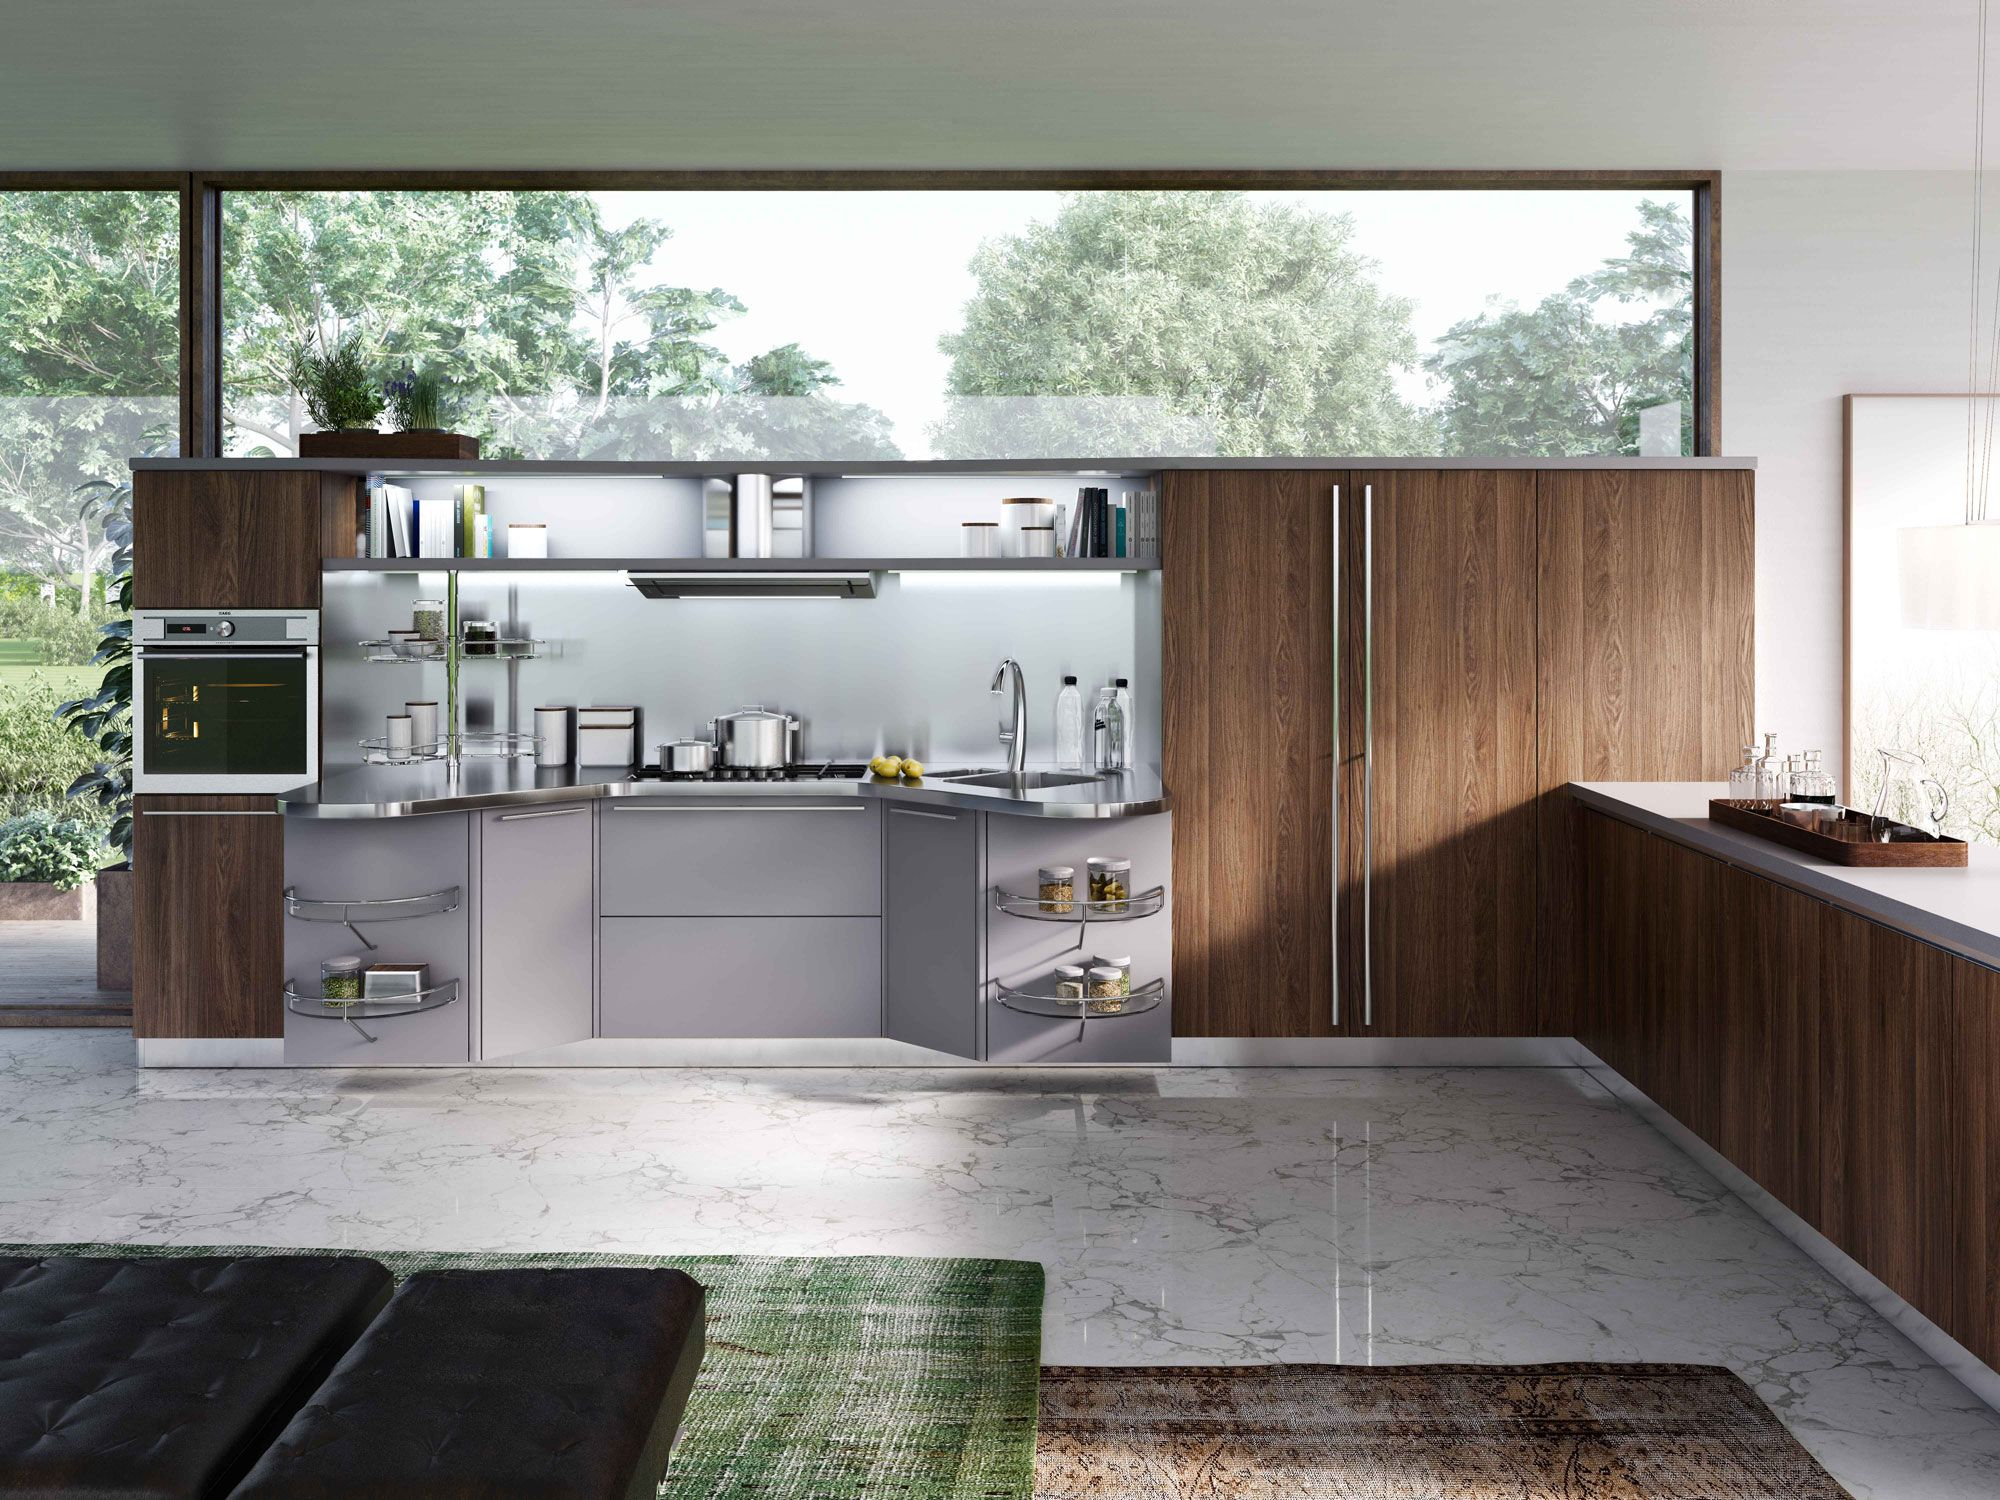 Cucine moderne: cucine design innovative con Skyline 2.0 ...